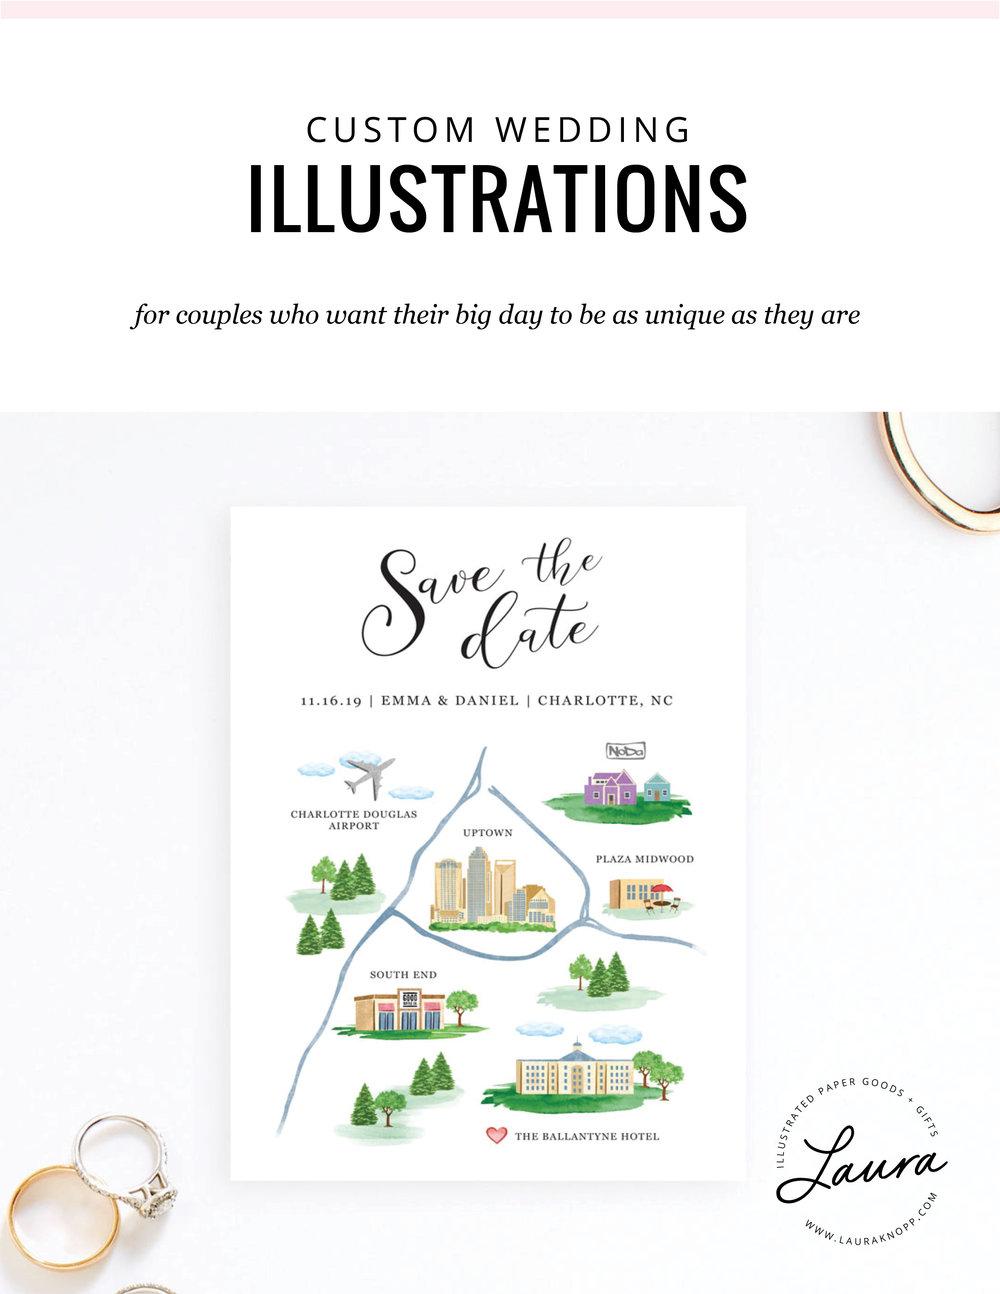 Custom-Wedding-Illustration-Guide.jpg